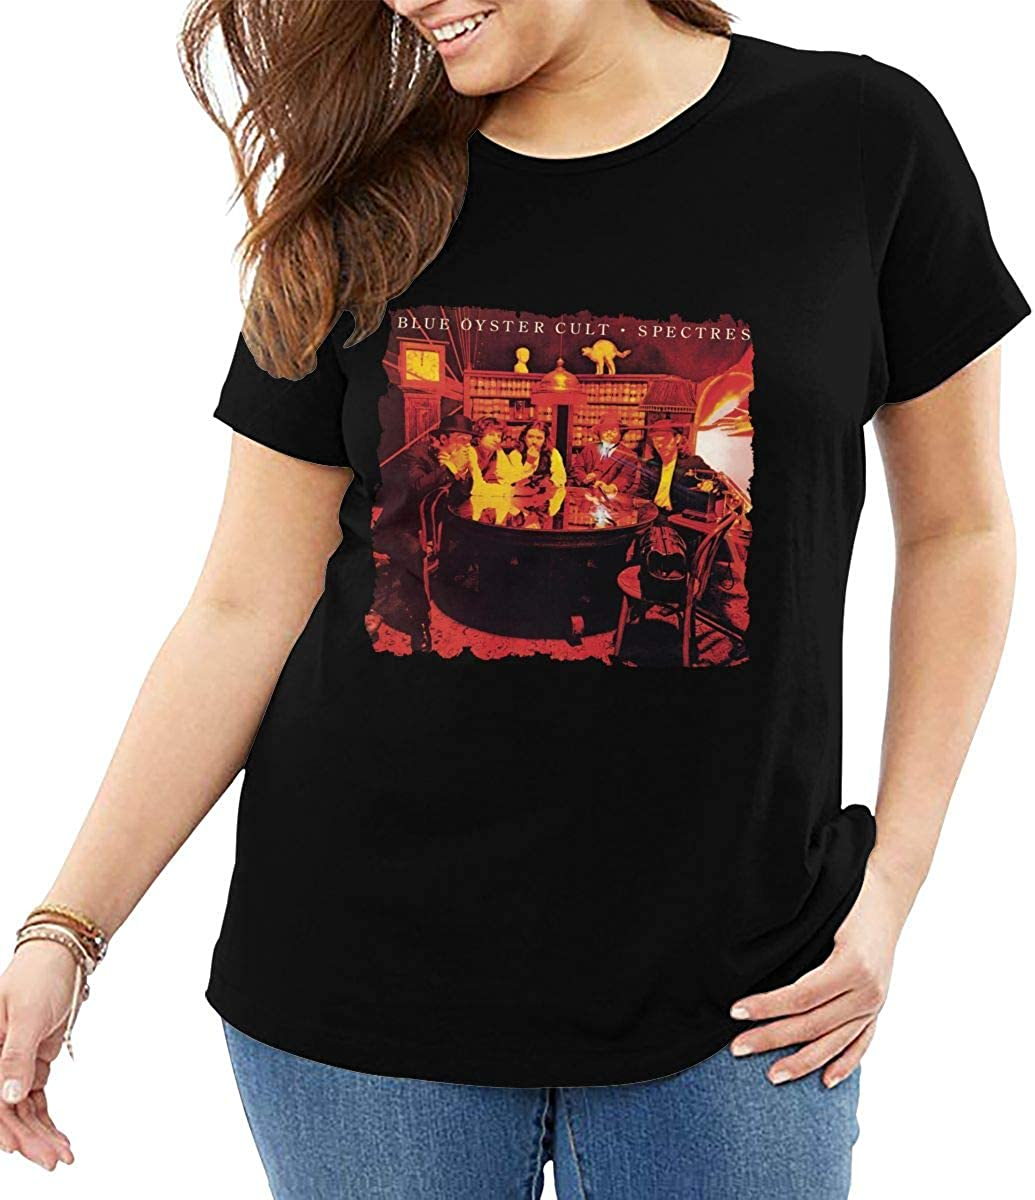 Blue Oyster Cult Spectres Womans Large Size Short Sleeve T Shirt High Waist T Shirts